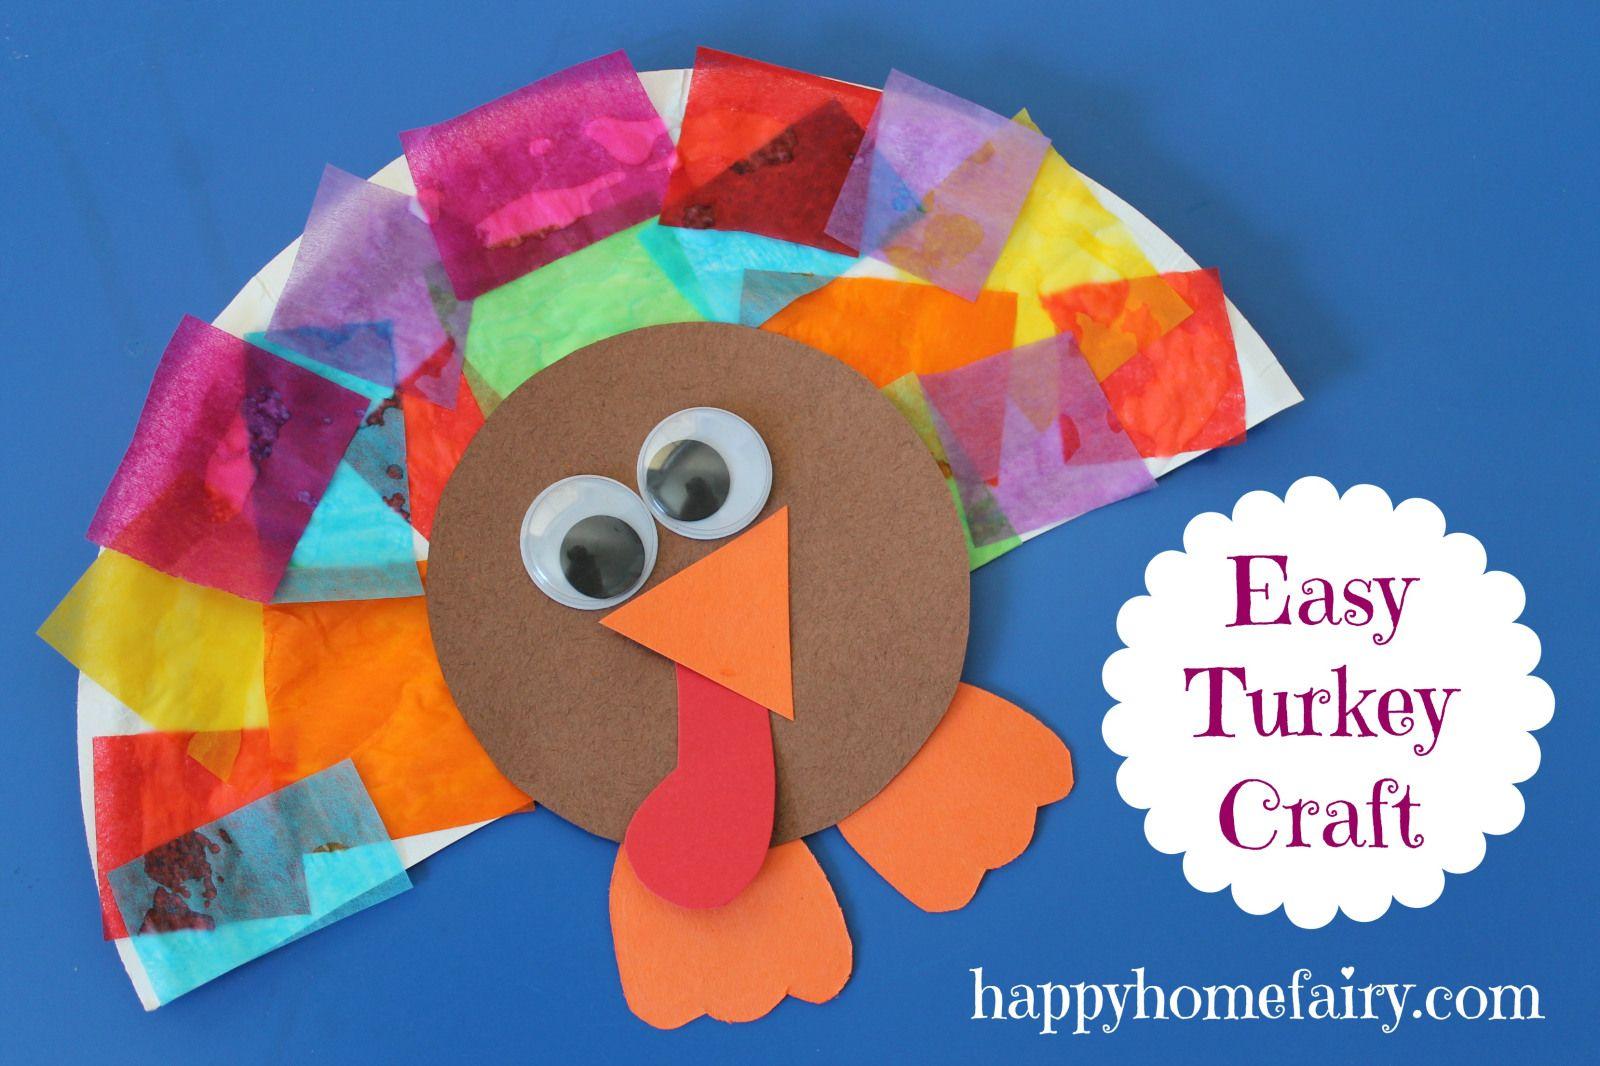 Easy Turkey Craft - Cute Thanksgiving craft idea for kids!